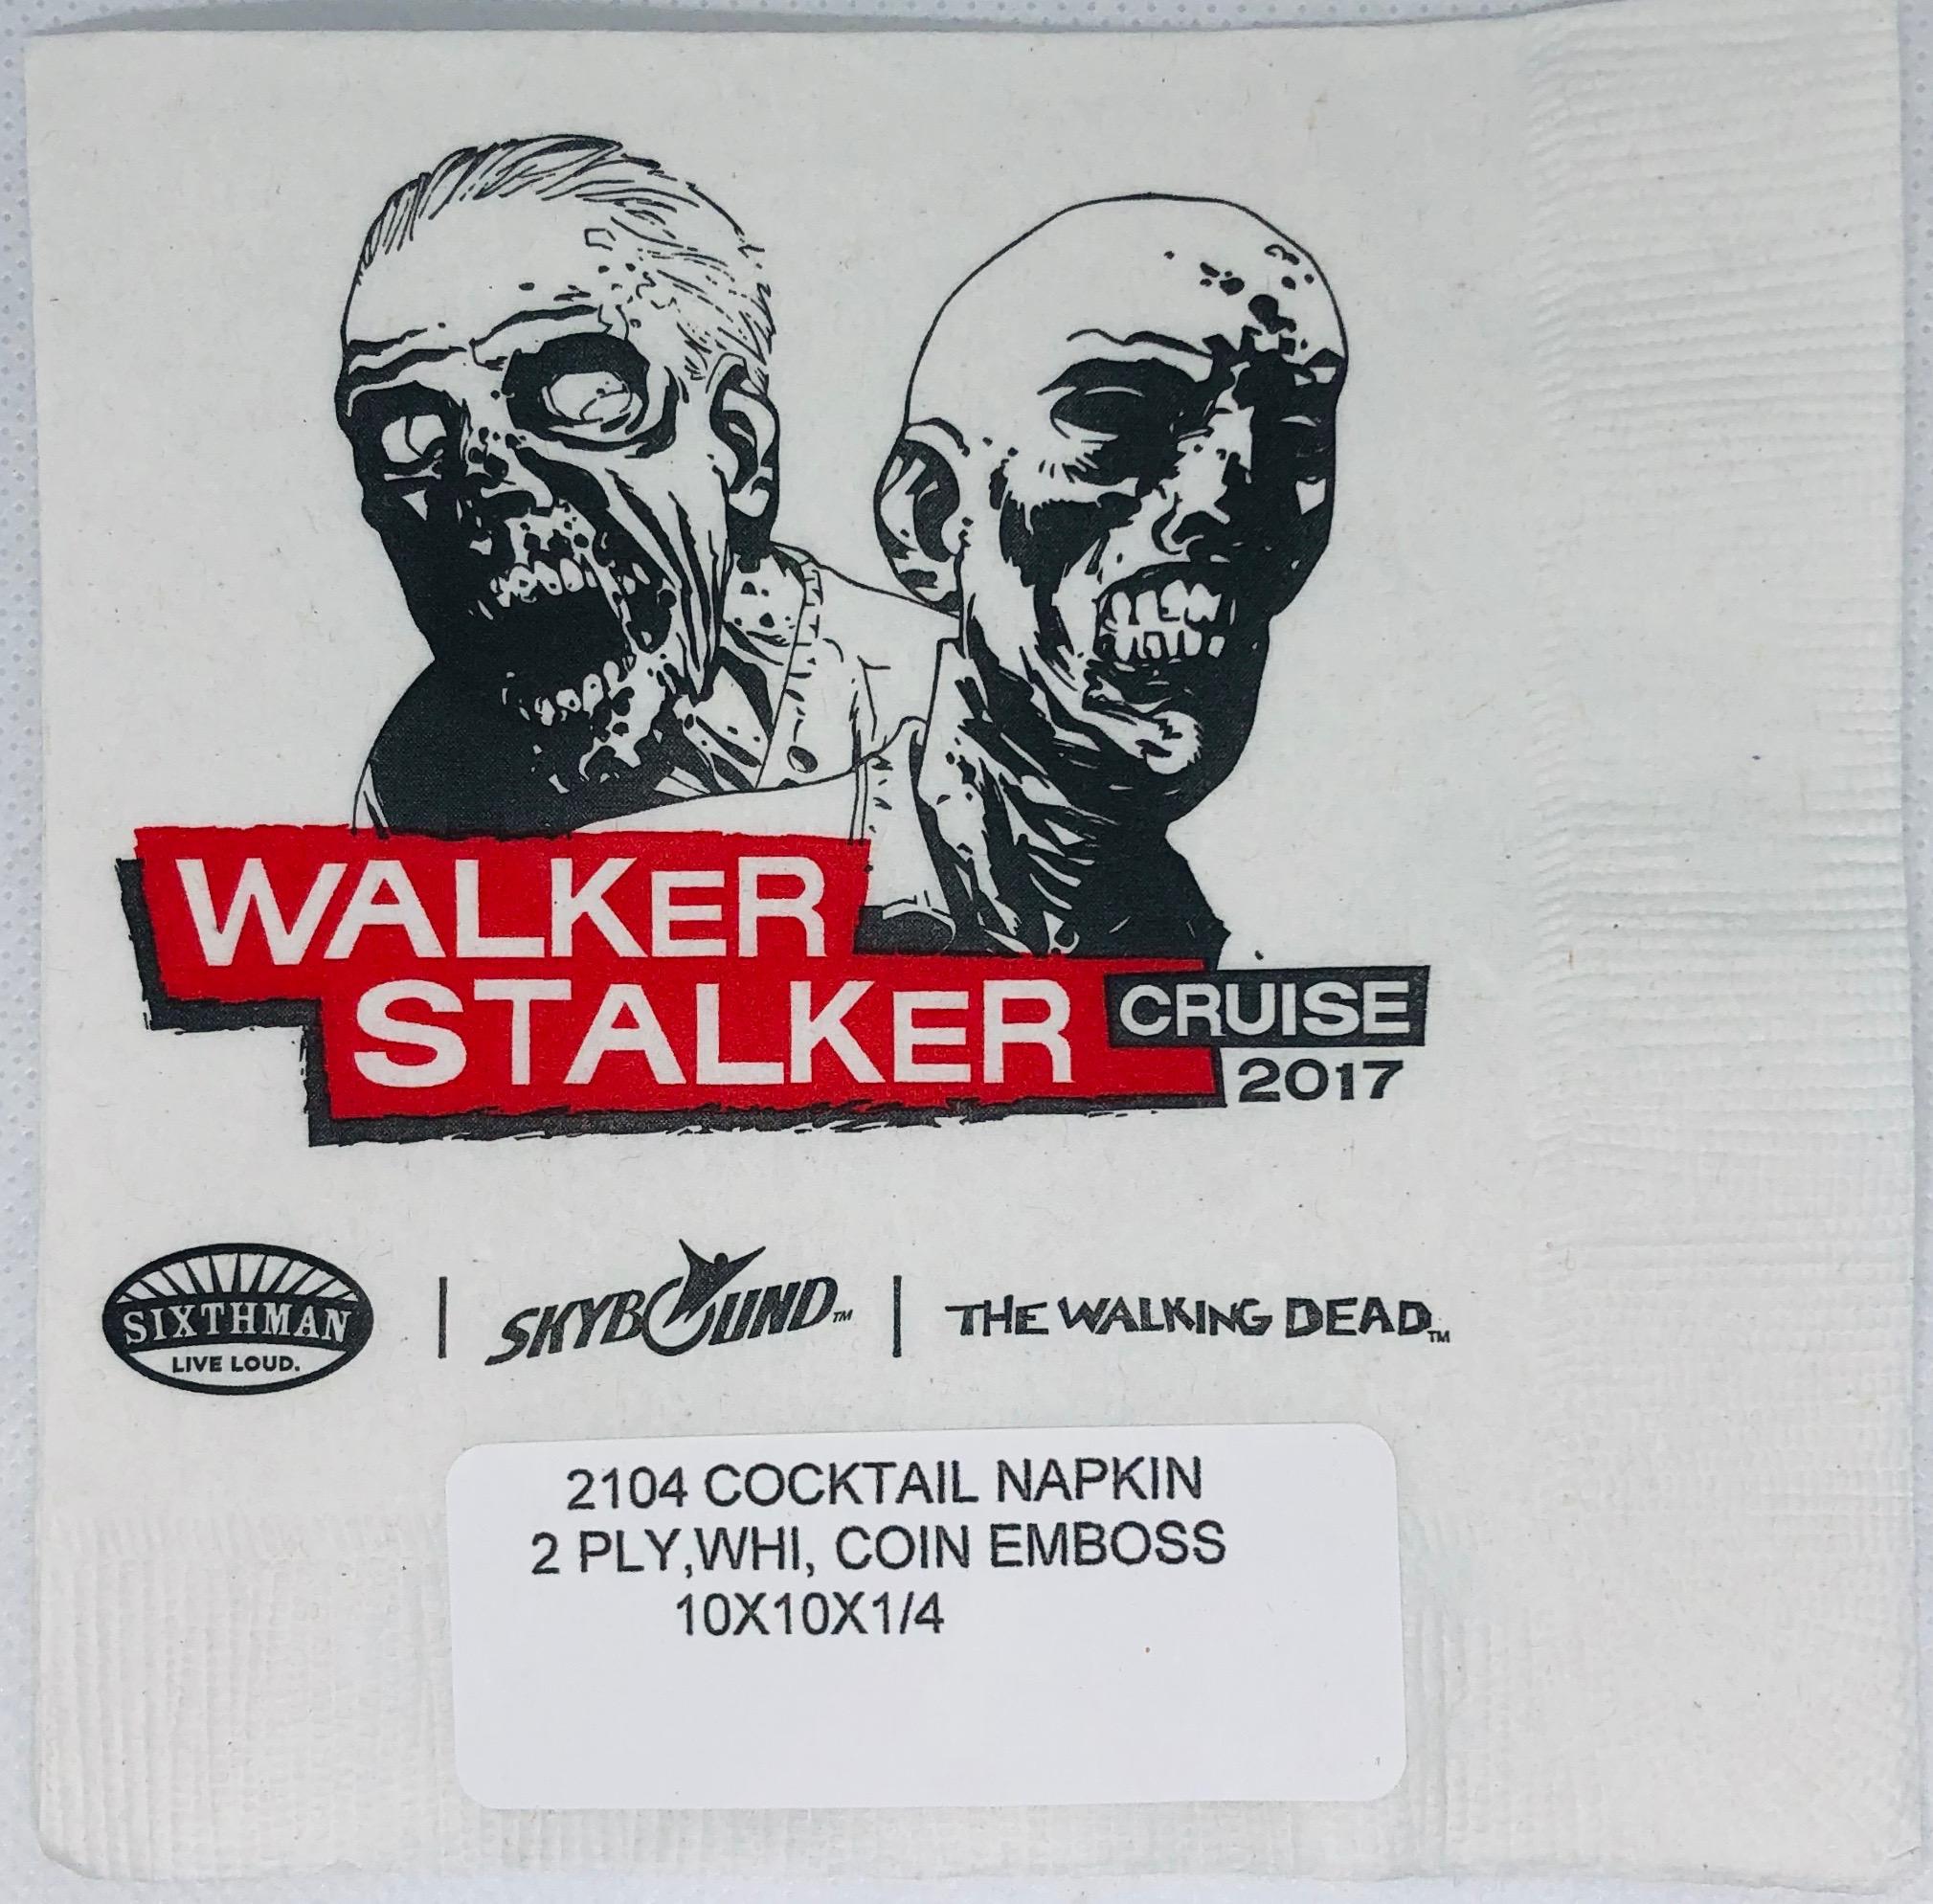 2 ply beverage napkin